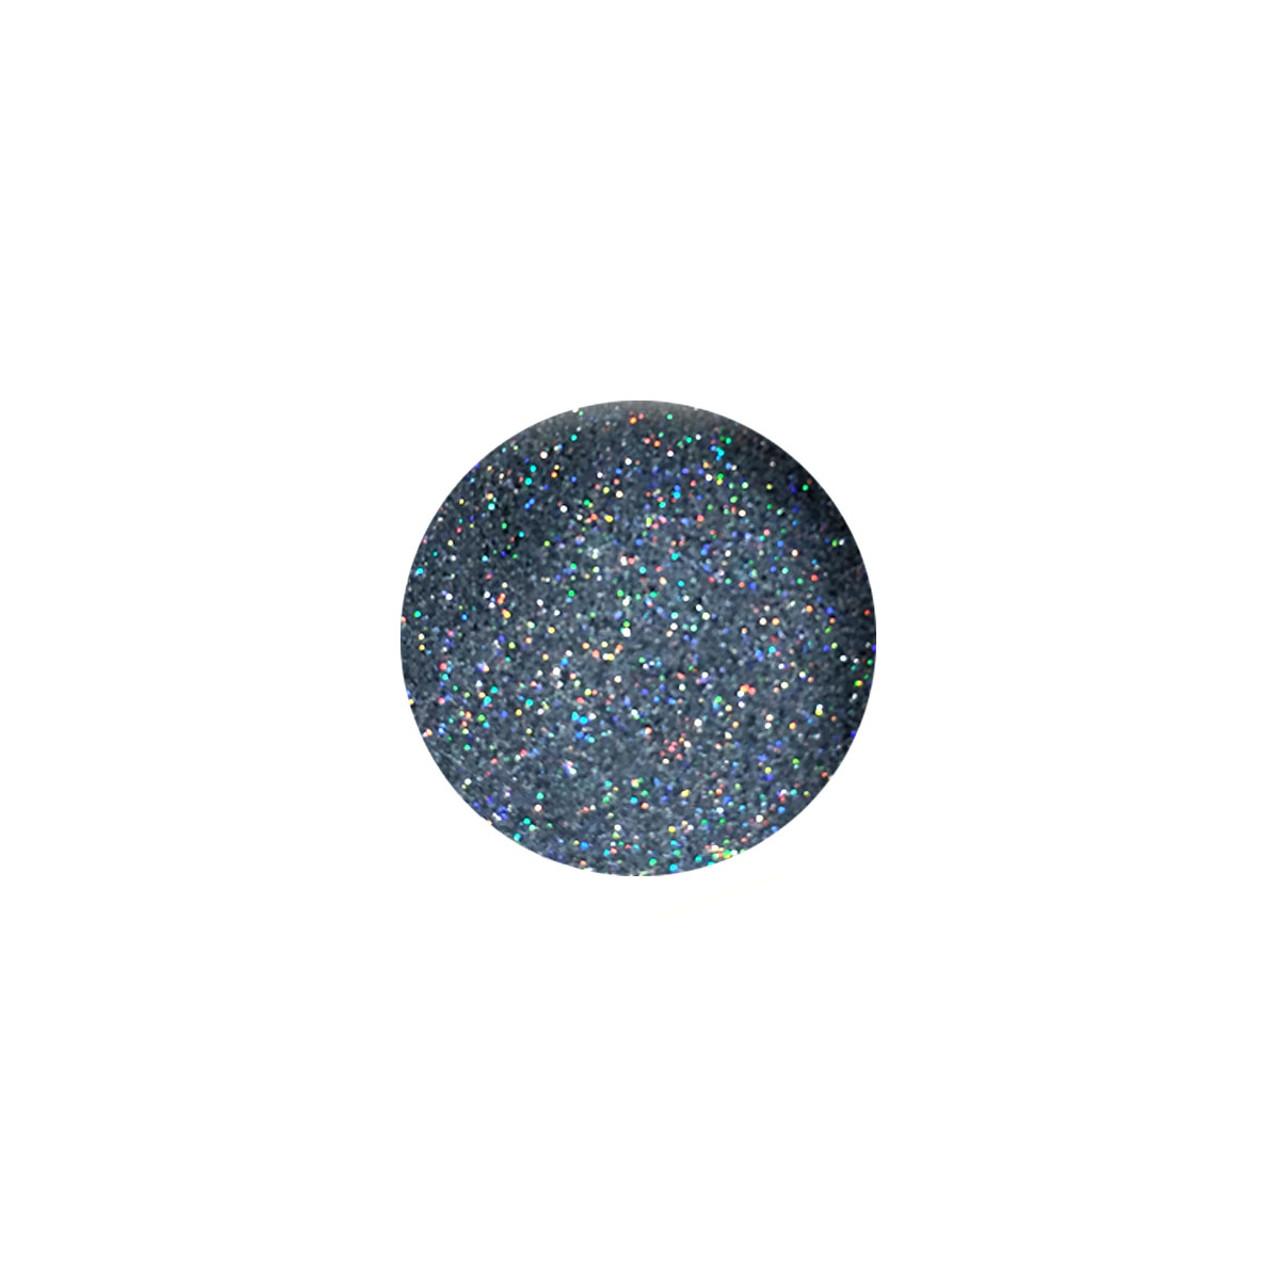 Holographic Glitter - 1gm